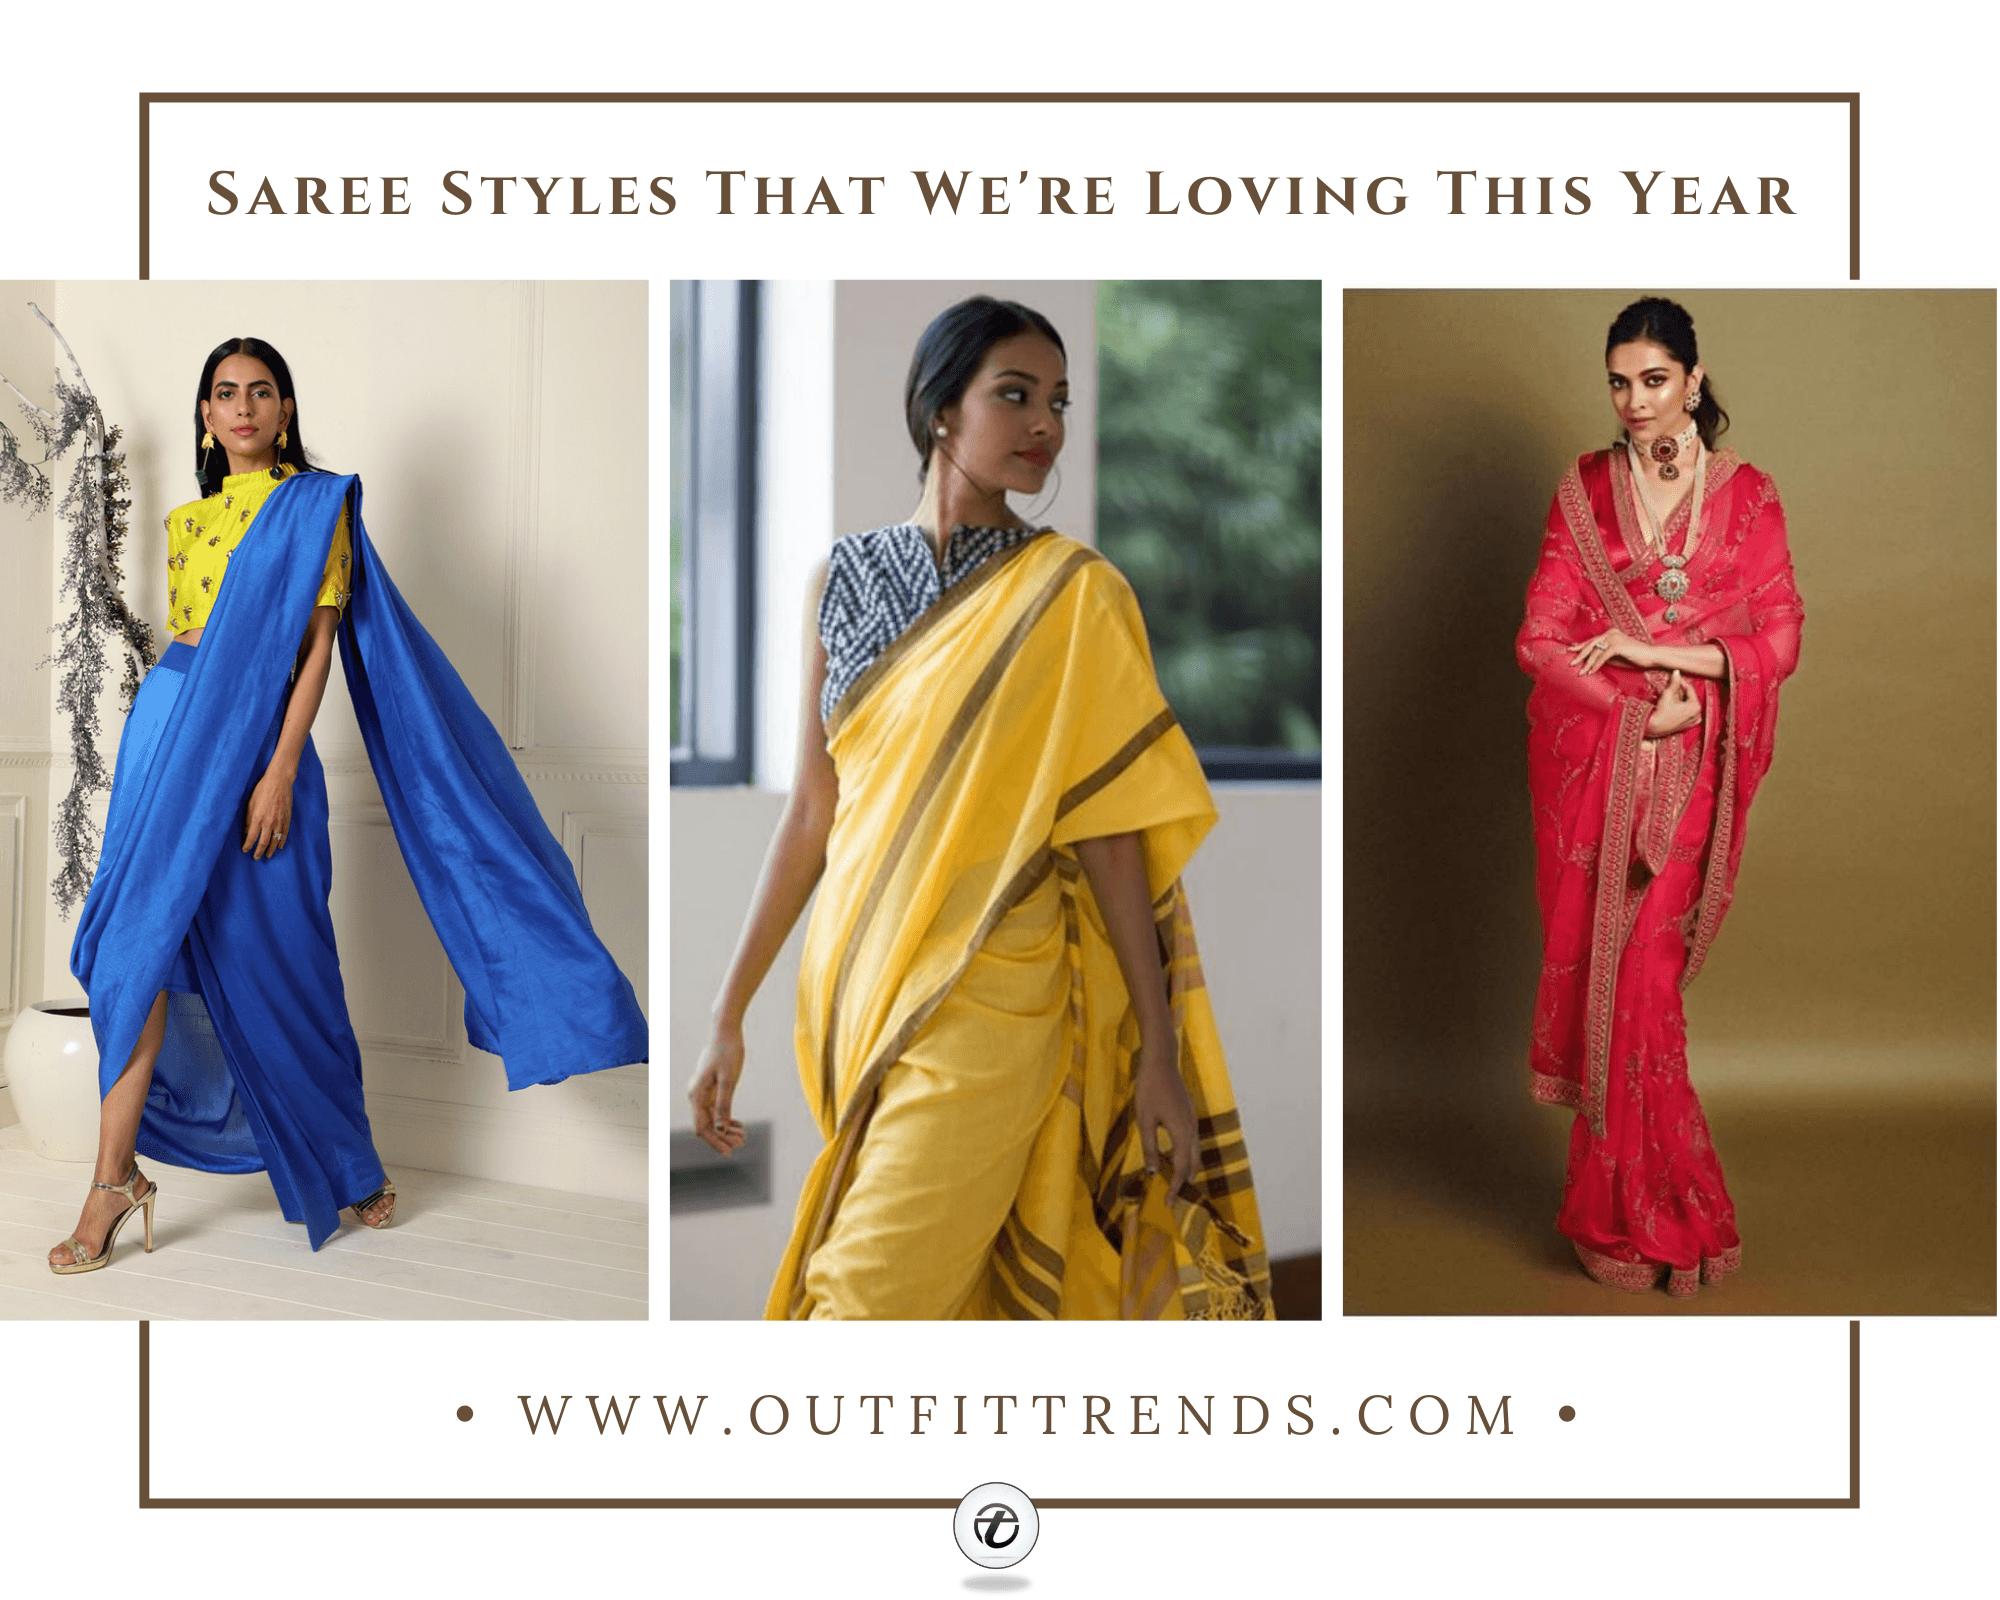 22 Most Elegant Saree Designs | Saree Wearing Tips and Ideas